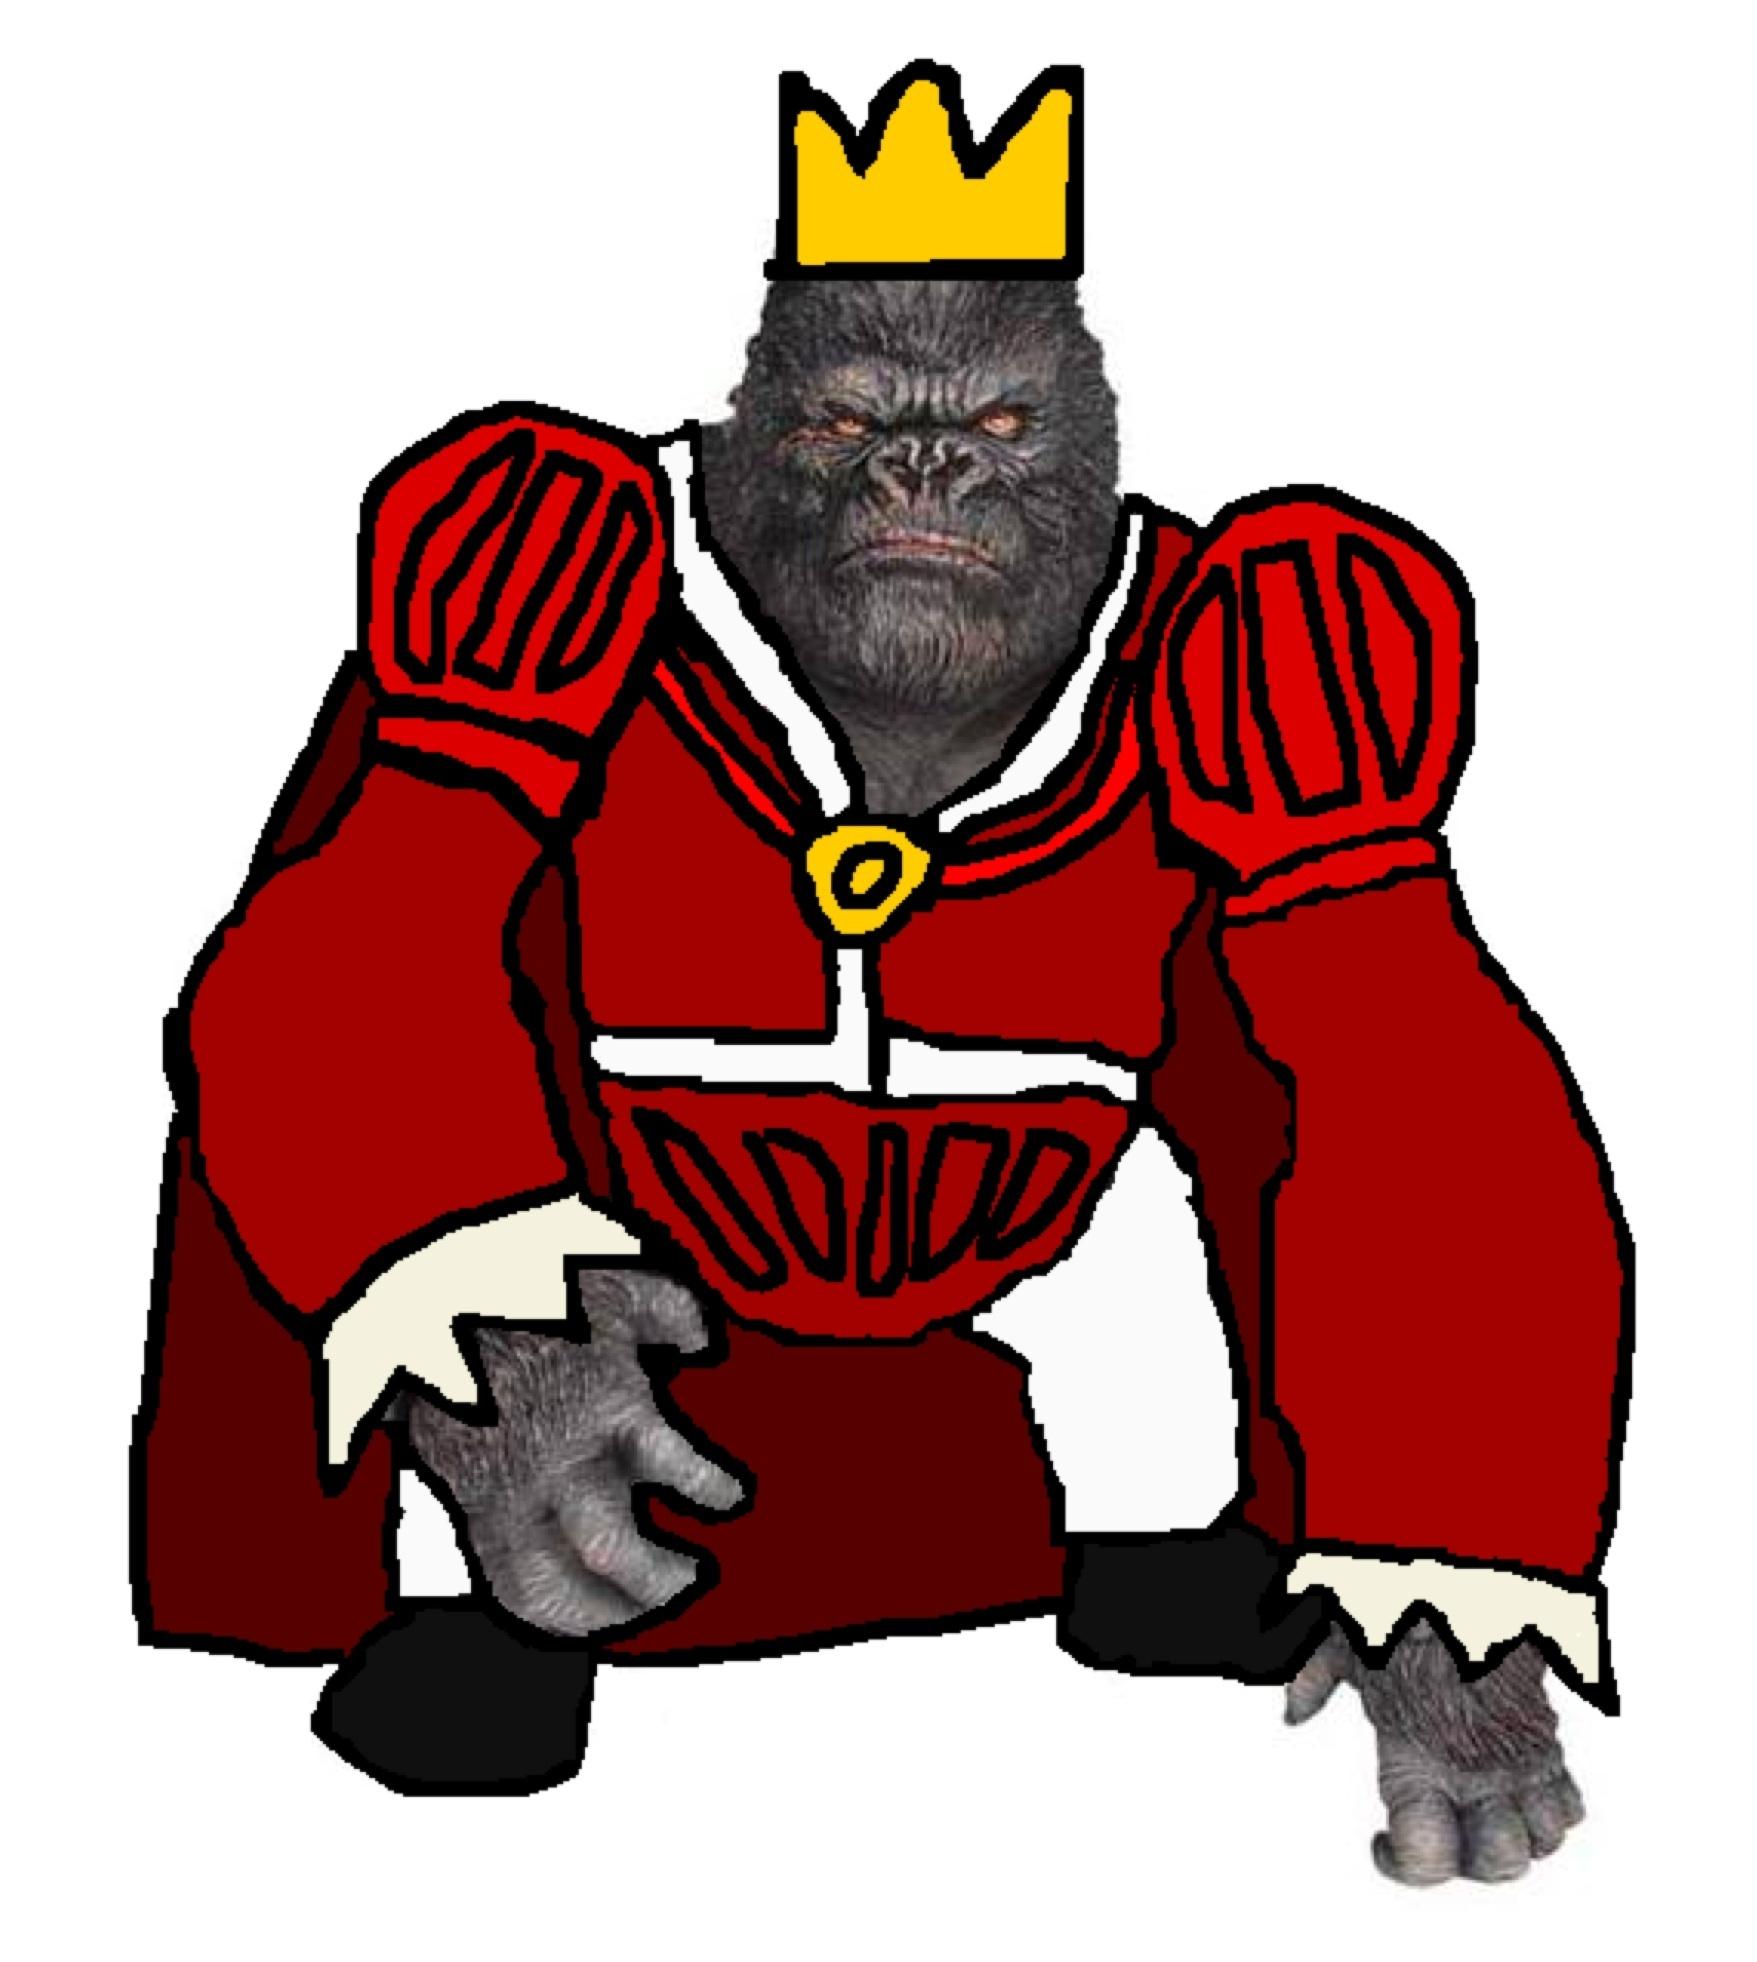 Free King Kong Cliparts, Download Free Clip Art, Free Clip.